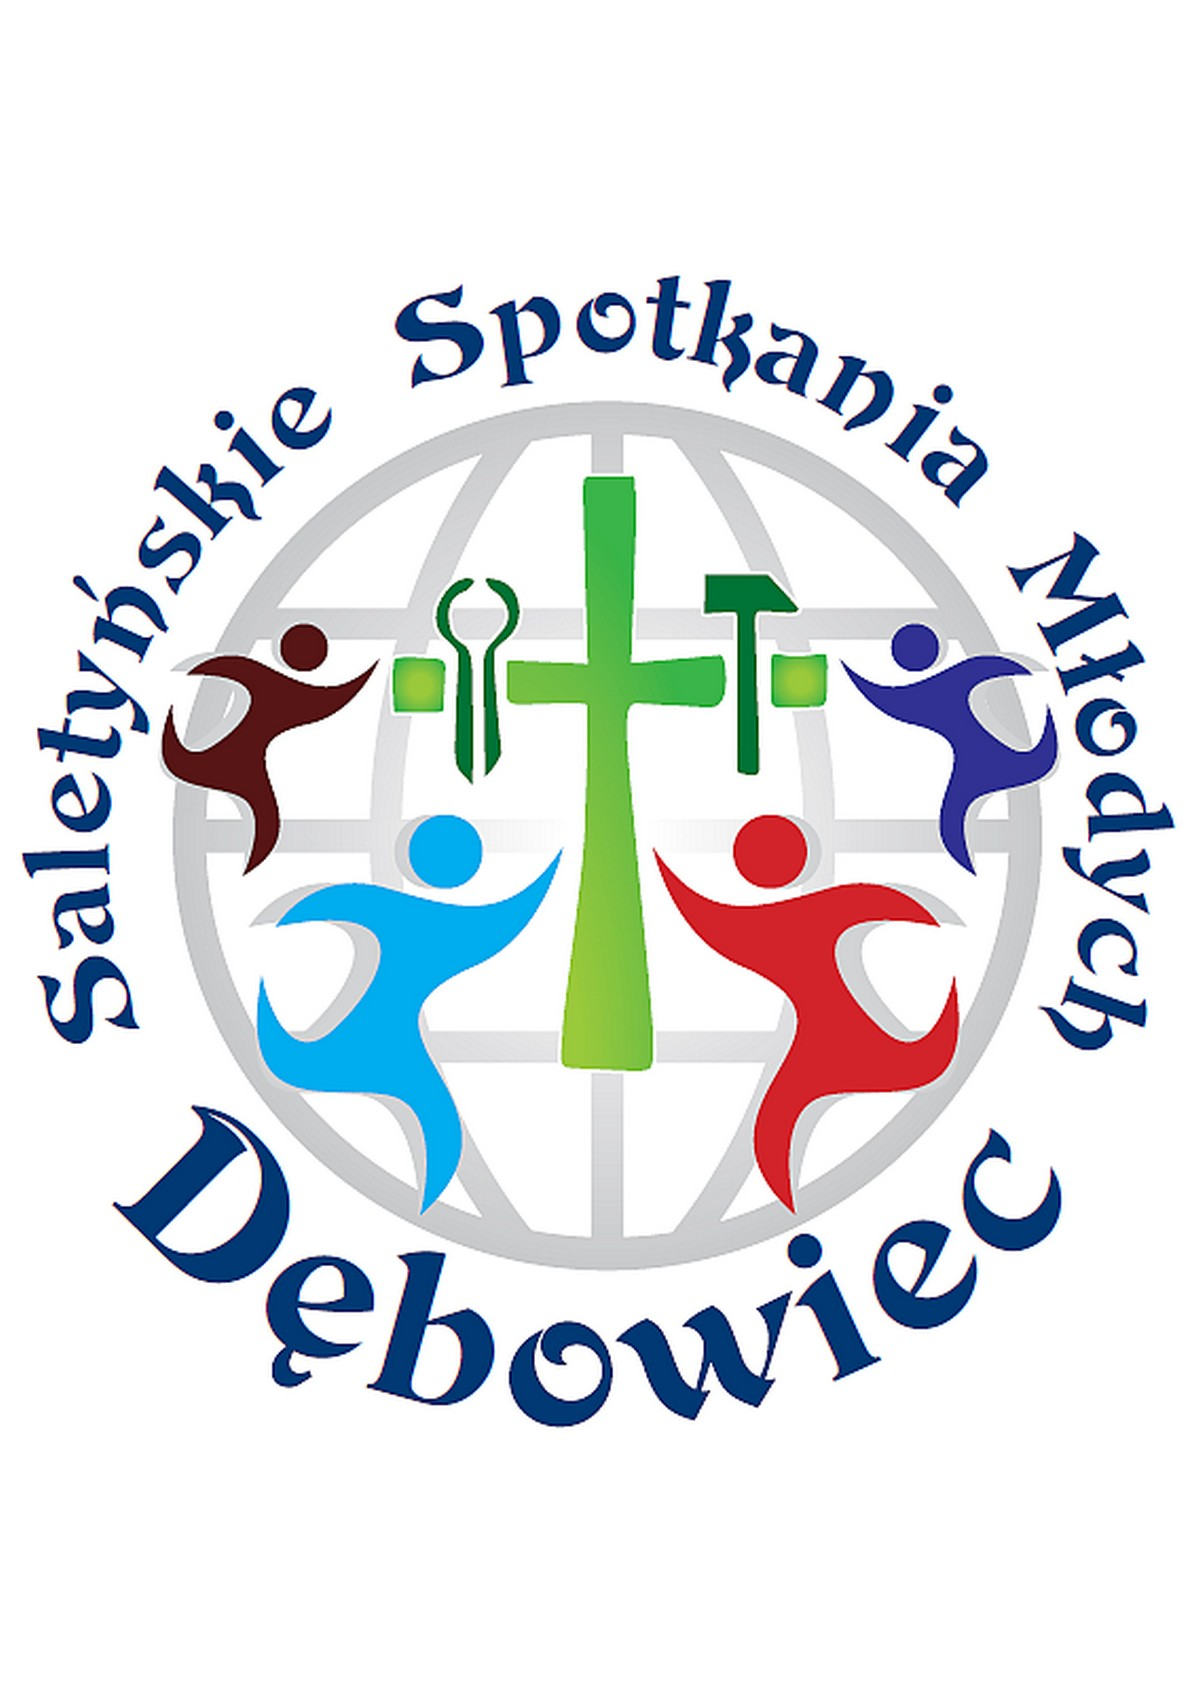 ssm-Debowiec2